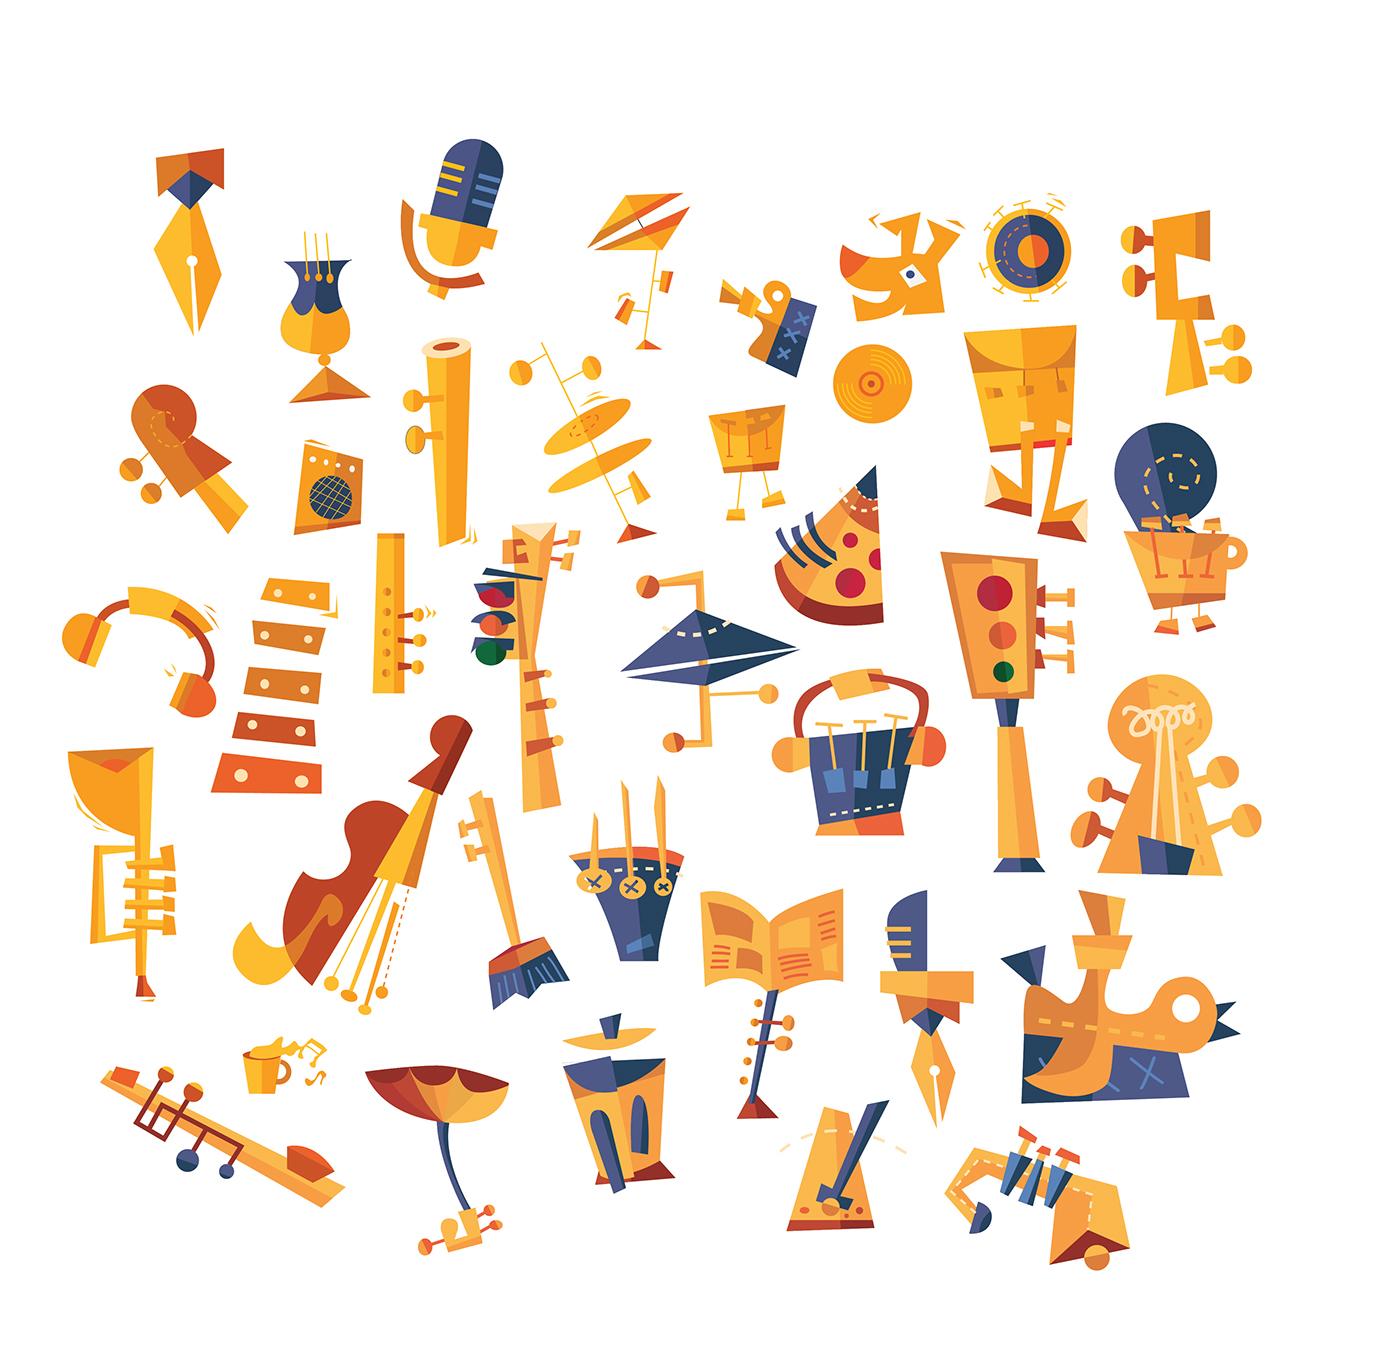 Illustration: Jazz Instruments Abstract Imagemaking on Behance